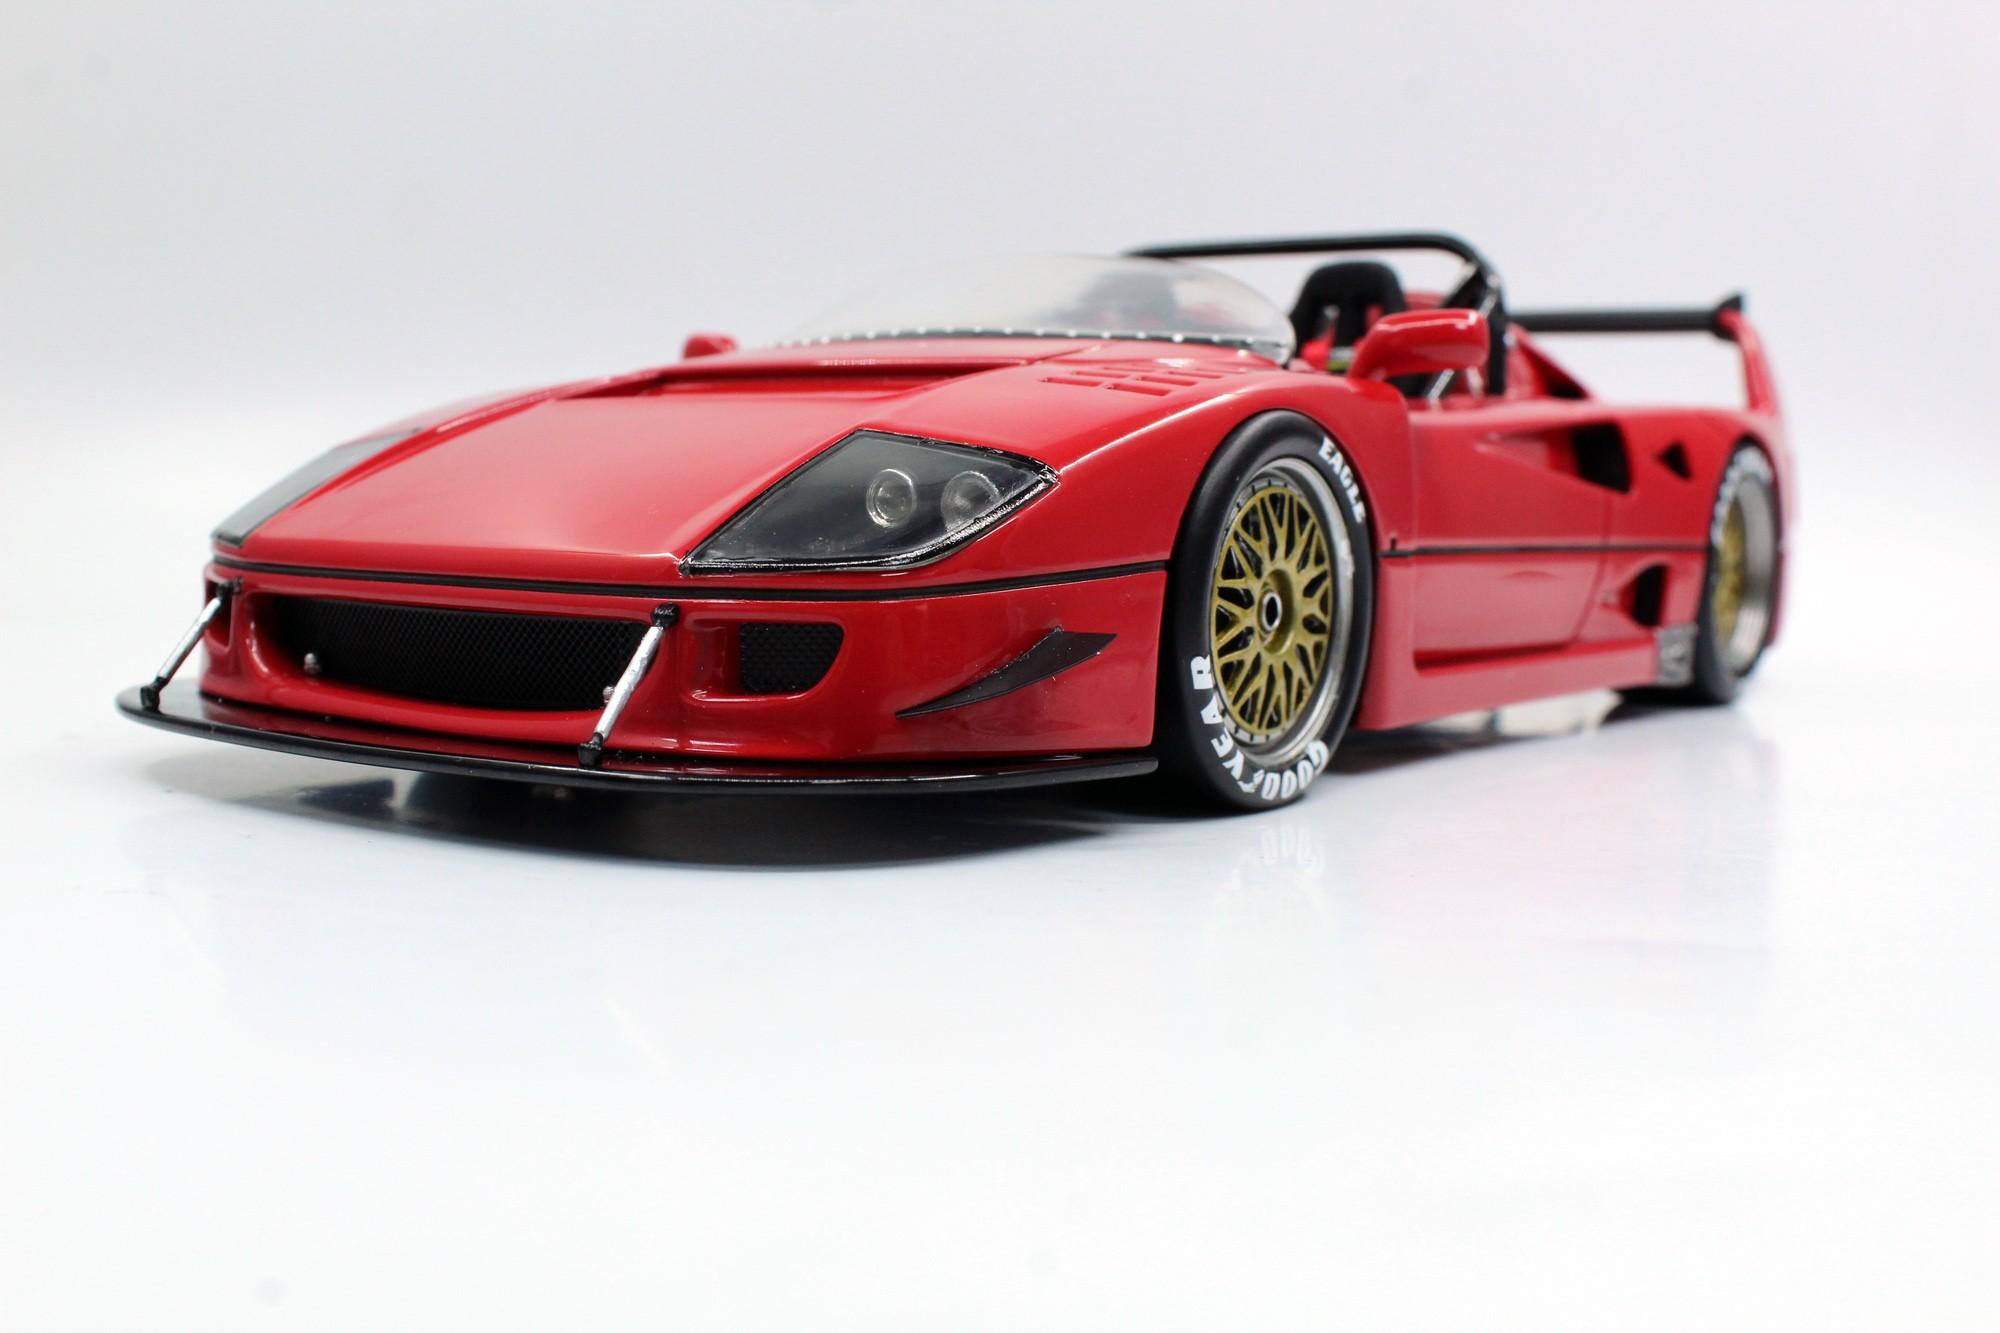 Top Marques Collectibles Ferrari F40 Lm Beurlys Barchetta 1 18 Red Top68b